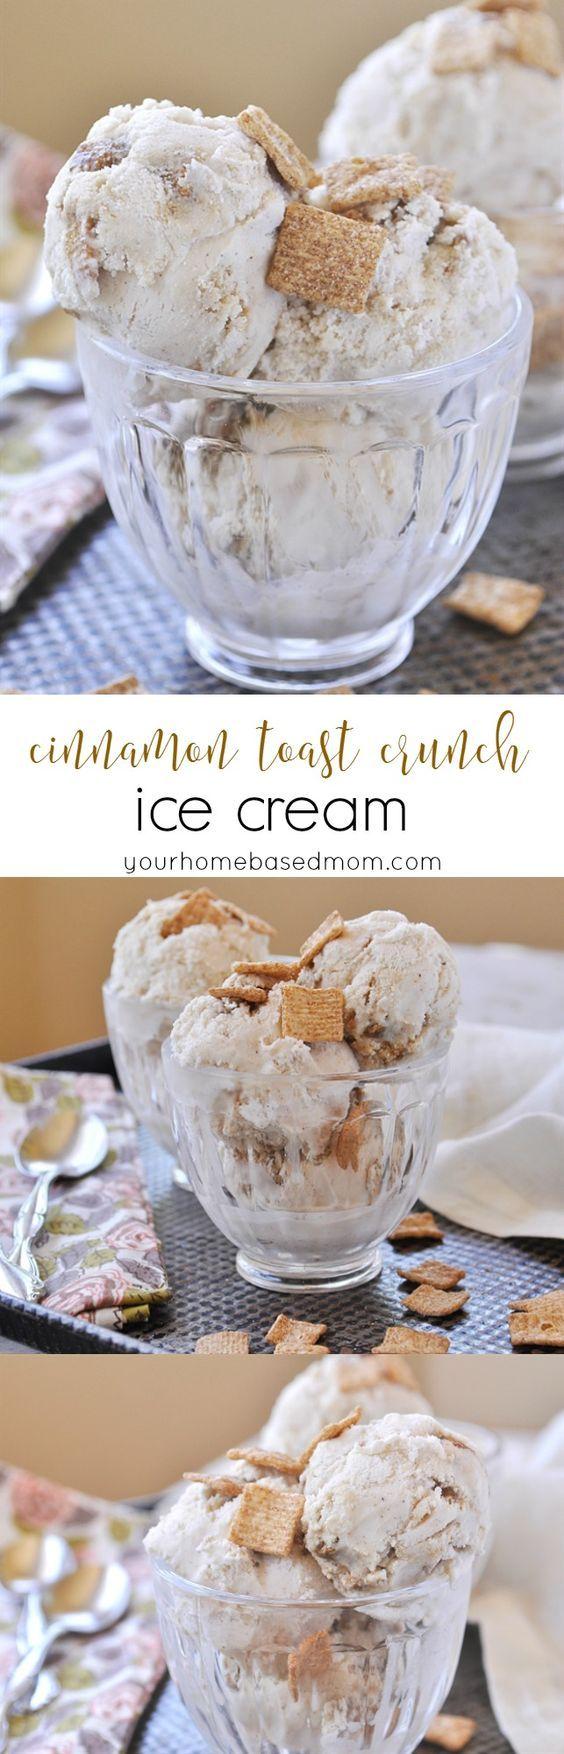 Cinnamon Toast Crunch Ice Cream #cinnamontoastcrunch